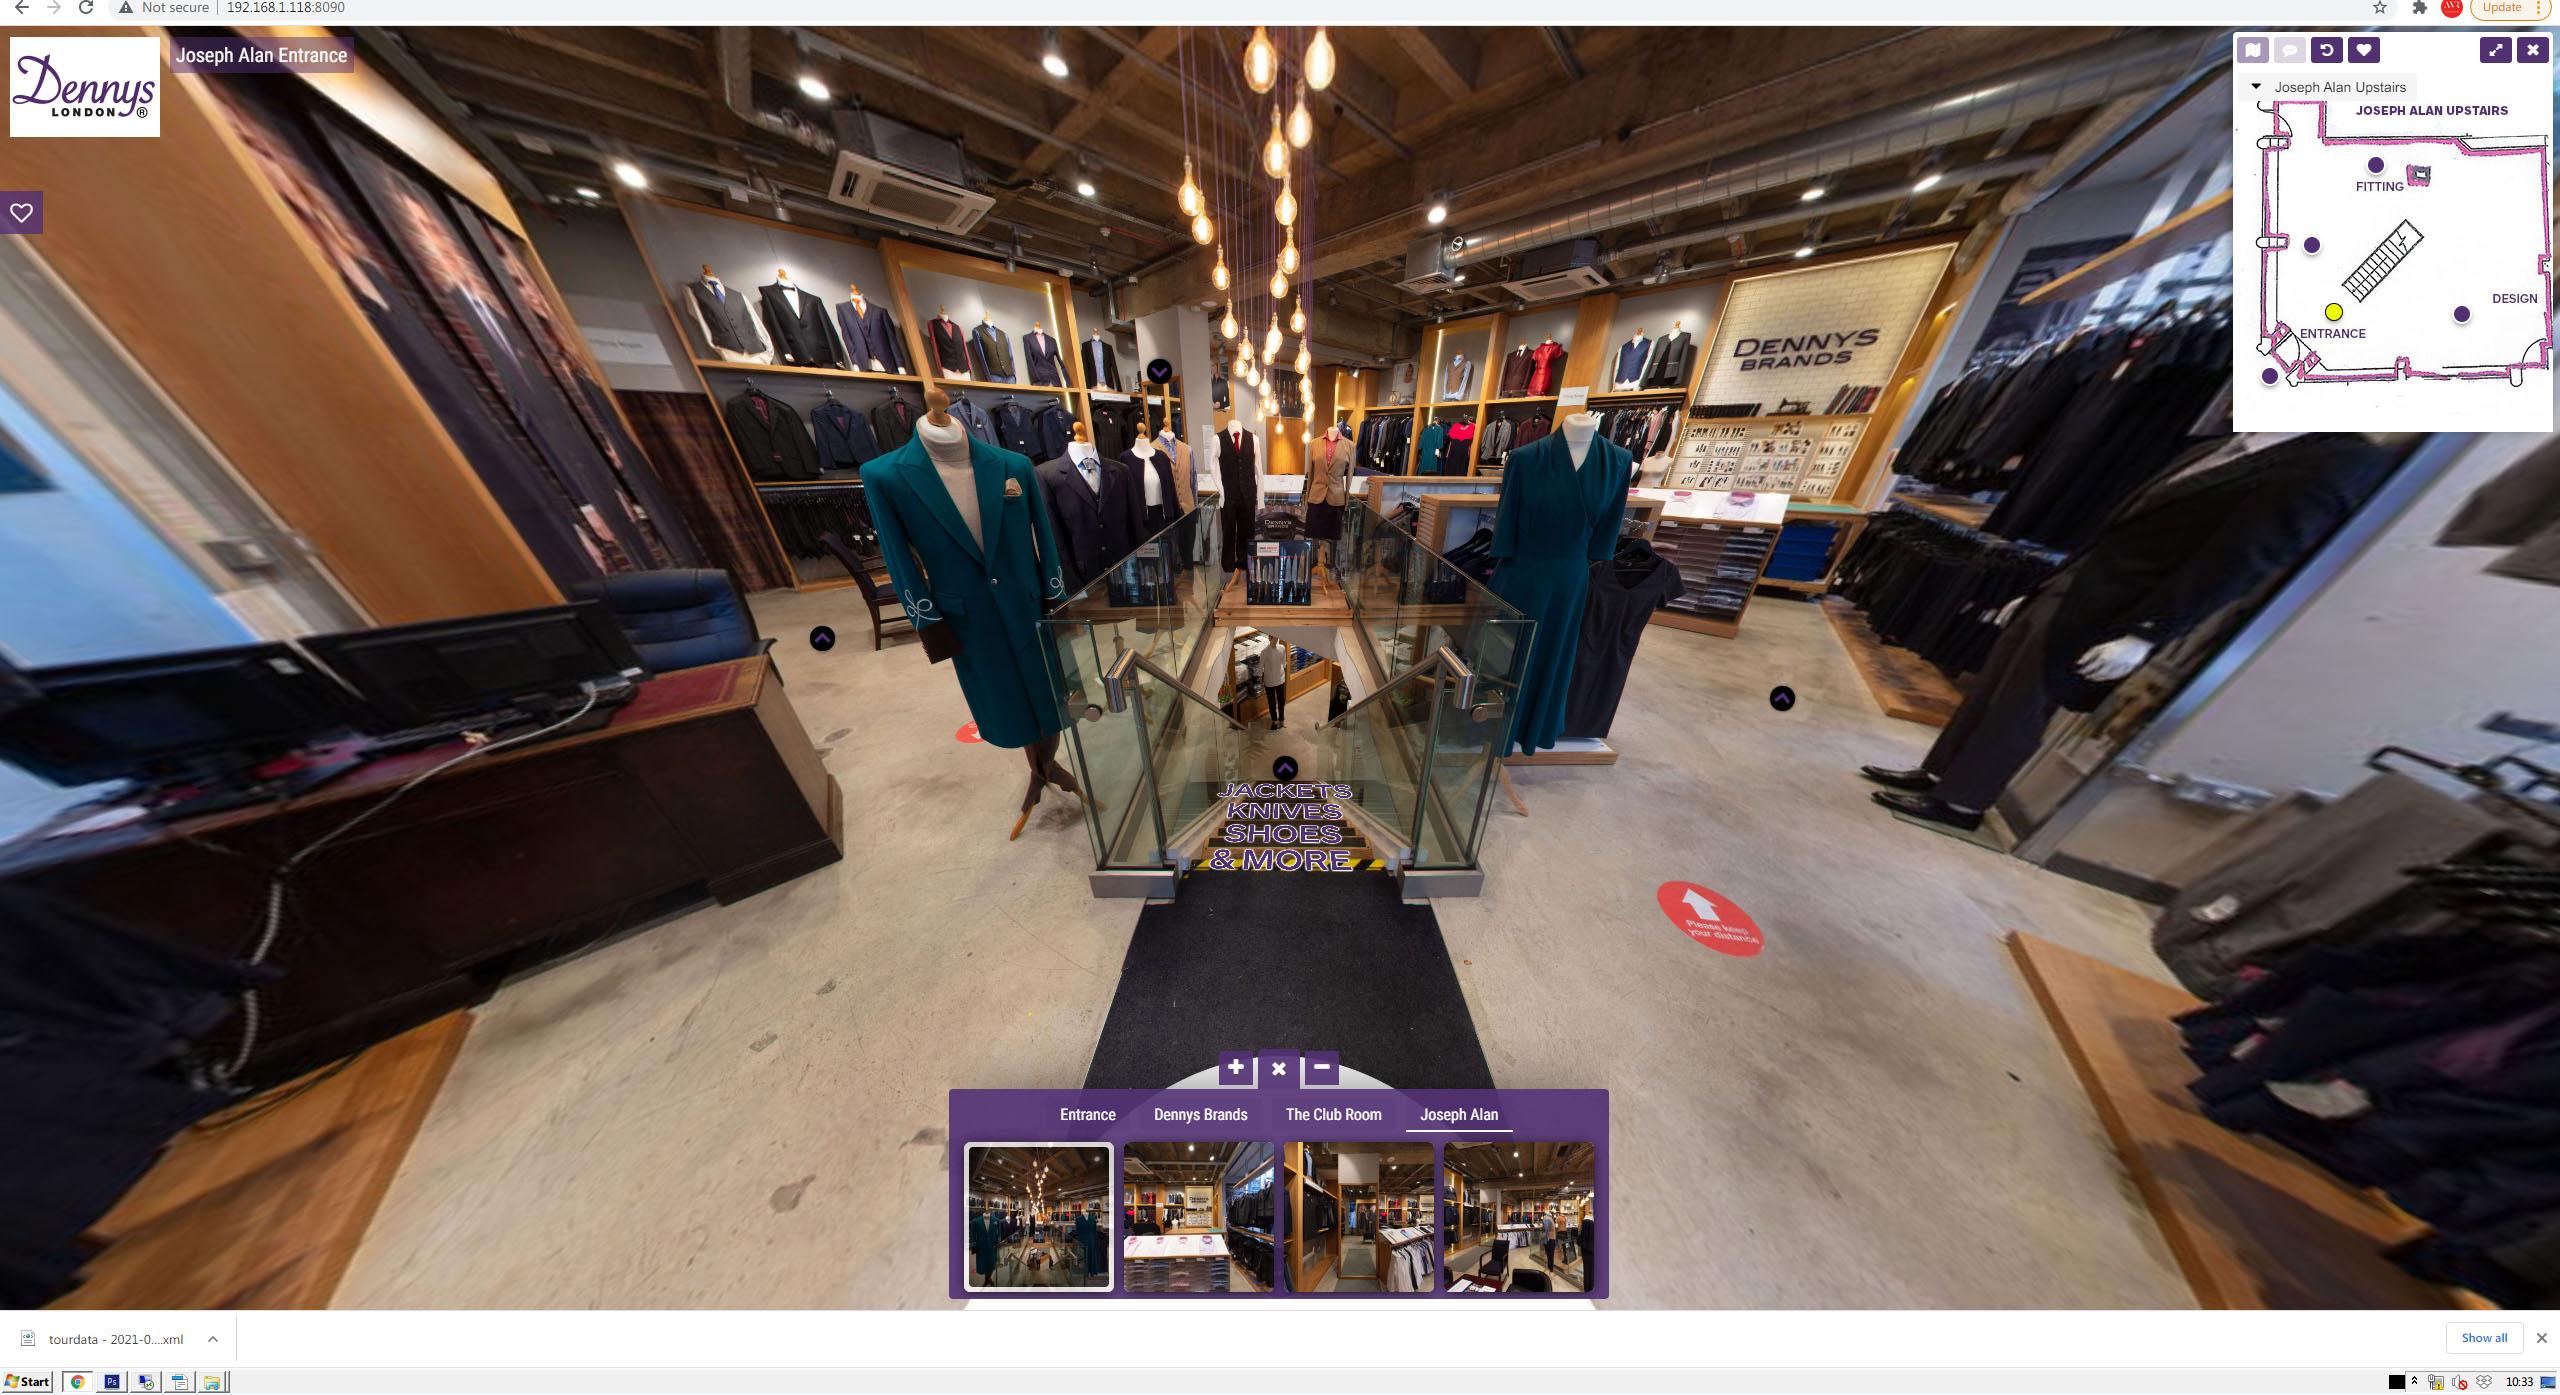 Dennys Brands Virtual Entrance